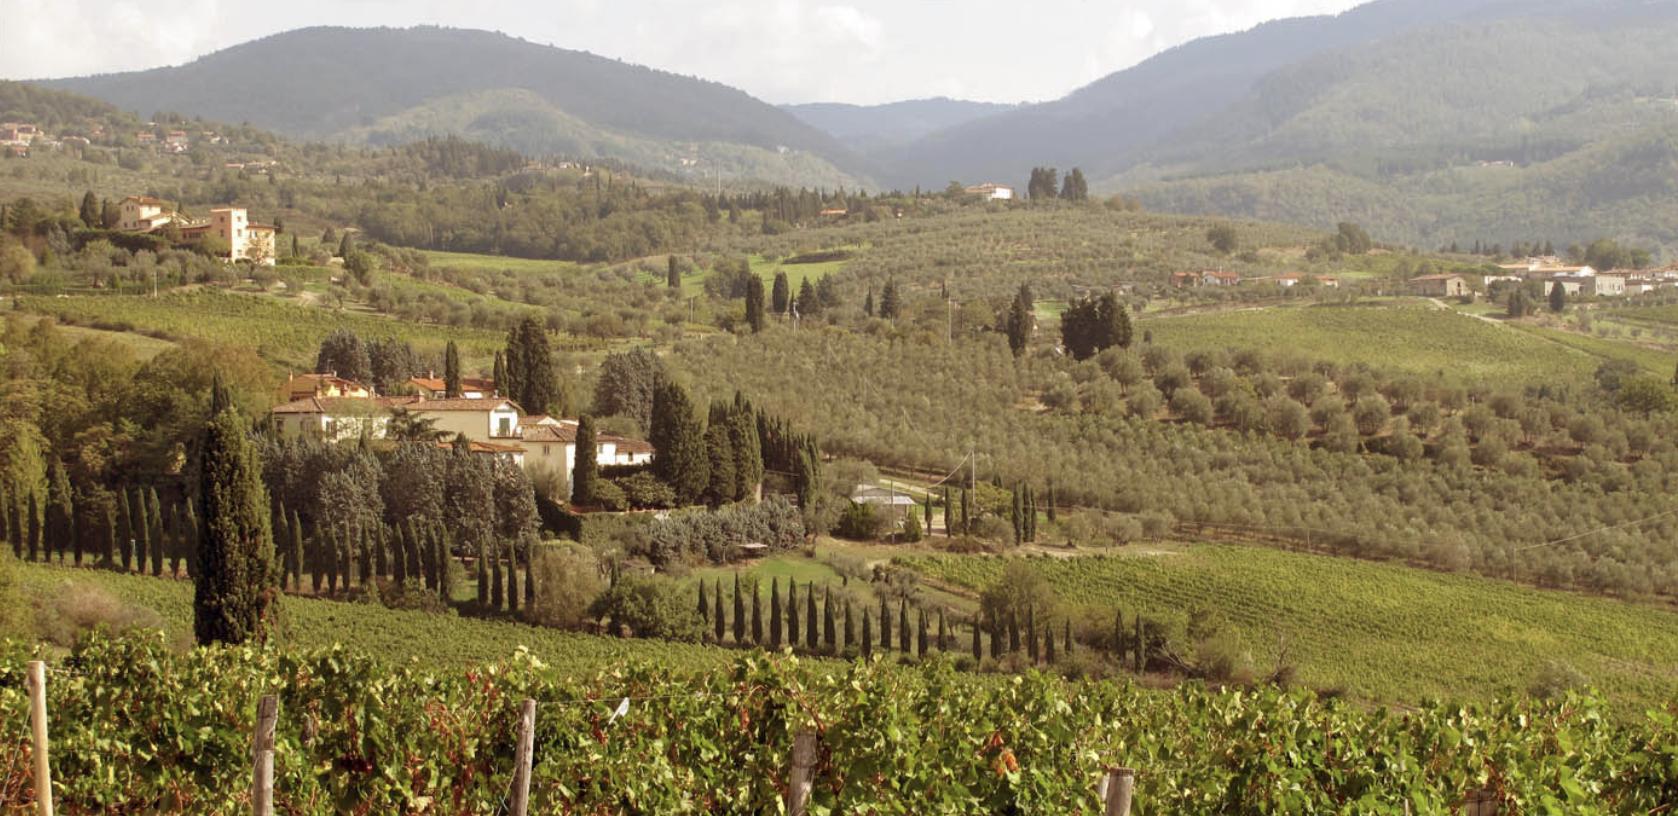 Travignoli Winery